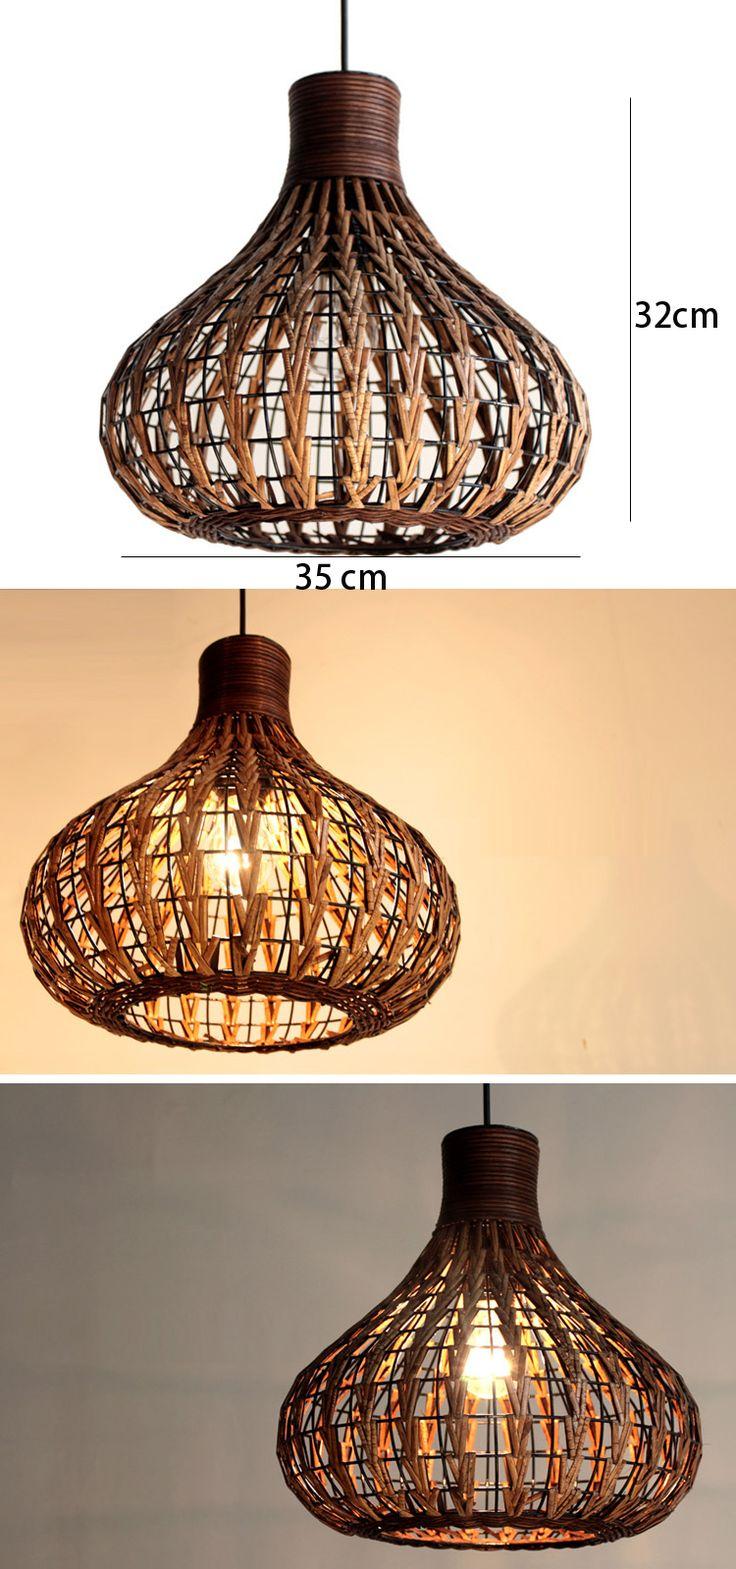 Wholesale 14 Handmade Modern Rattan Ceiling Pendant Lamp Living Lights Fixture Chandelier light, Free shipping, $115.98-124.31/Piece   DHgate